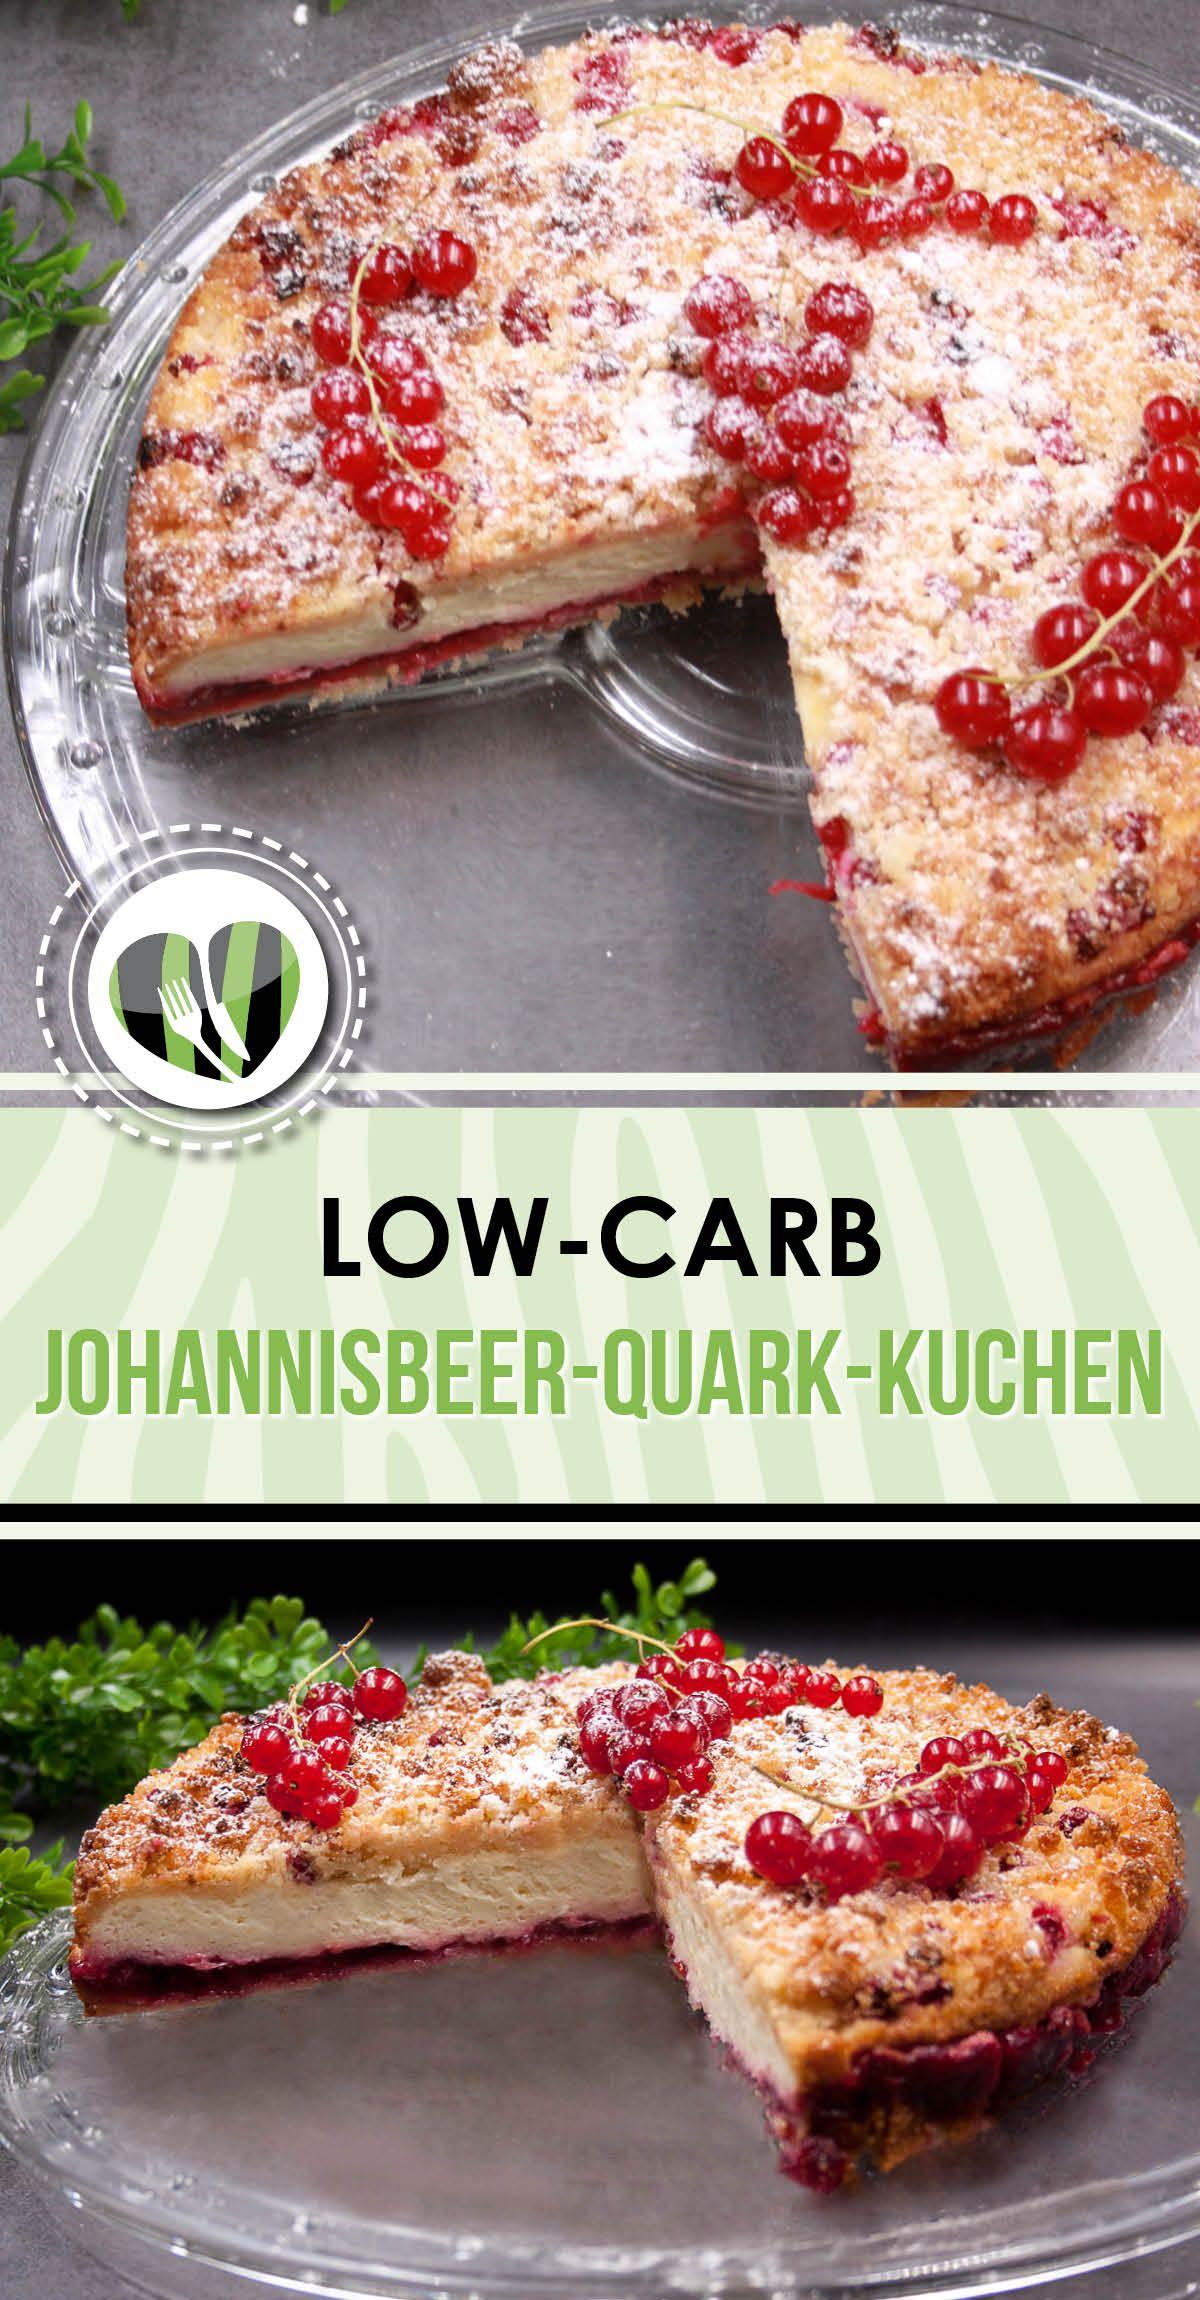 Low Carb Johannisbeer Quark Kuchen Low Carb Johannisbeerkuchen Rezepte Lecker